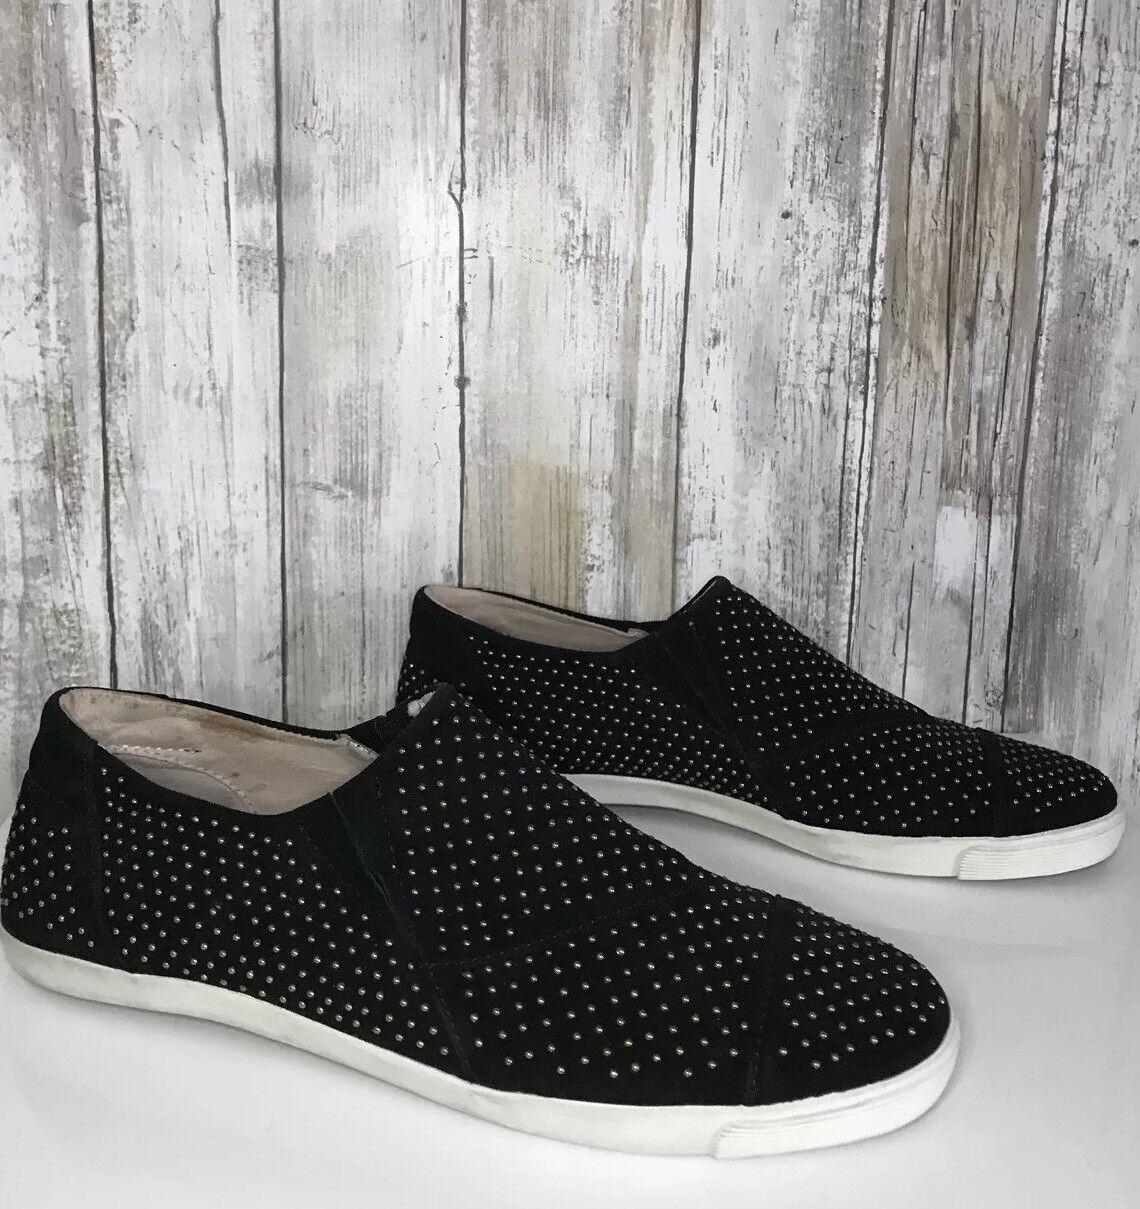 $270 AERIN Marina Black Suede Studded Stud Loafer Comfort Slip On Flats 7.5 *